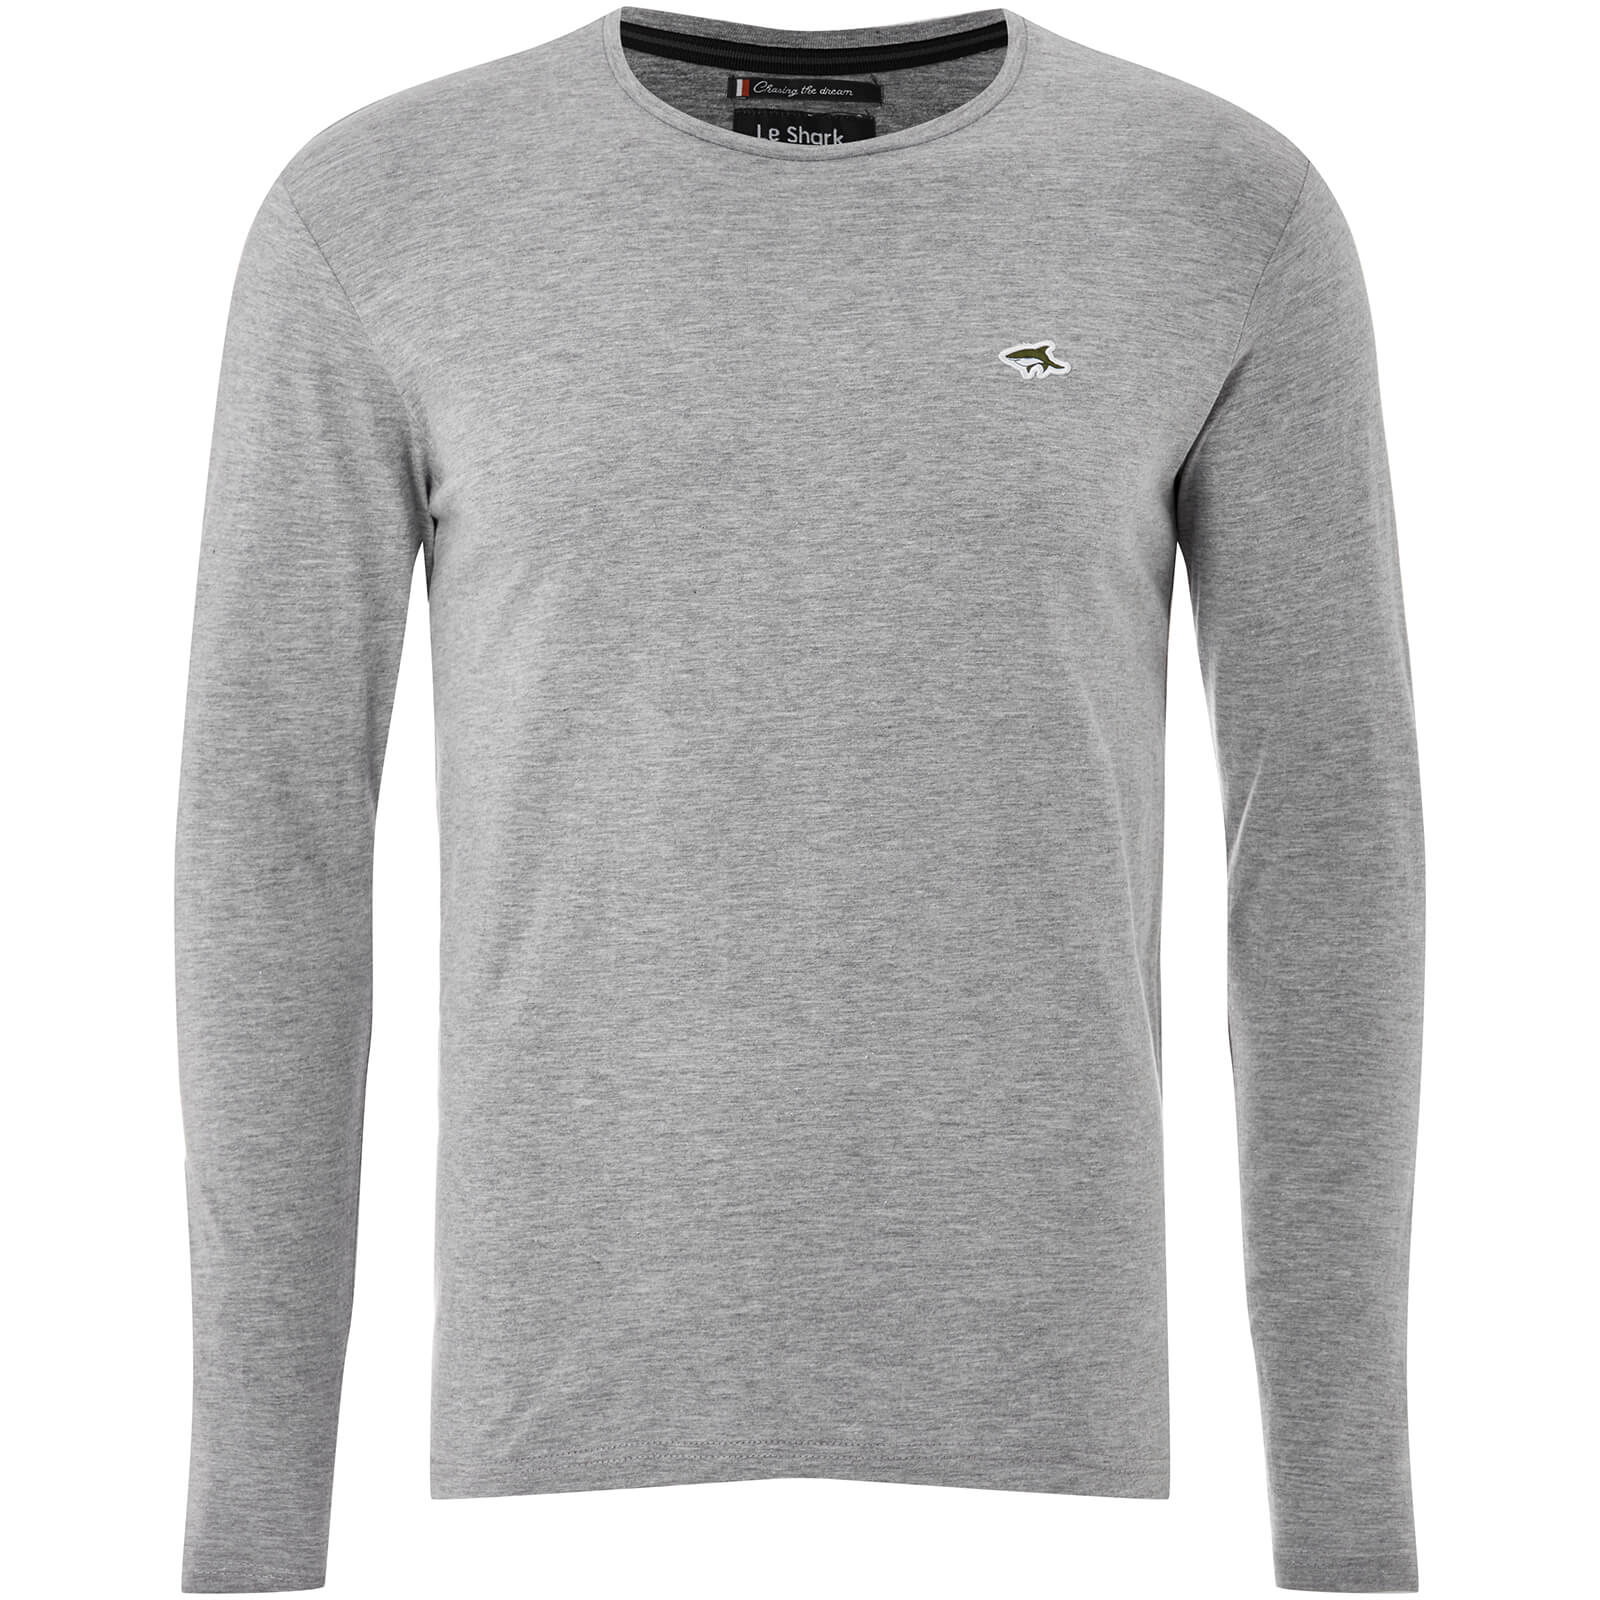 38d39820dce2 Le Shark Men's Lambeth Long Sleeve T-Shirt - Light Grey Marl Clothing    Zavvi